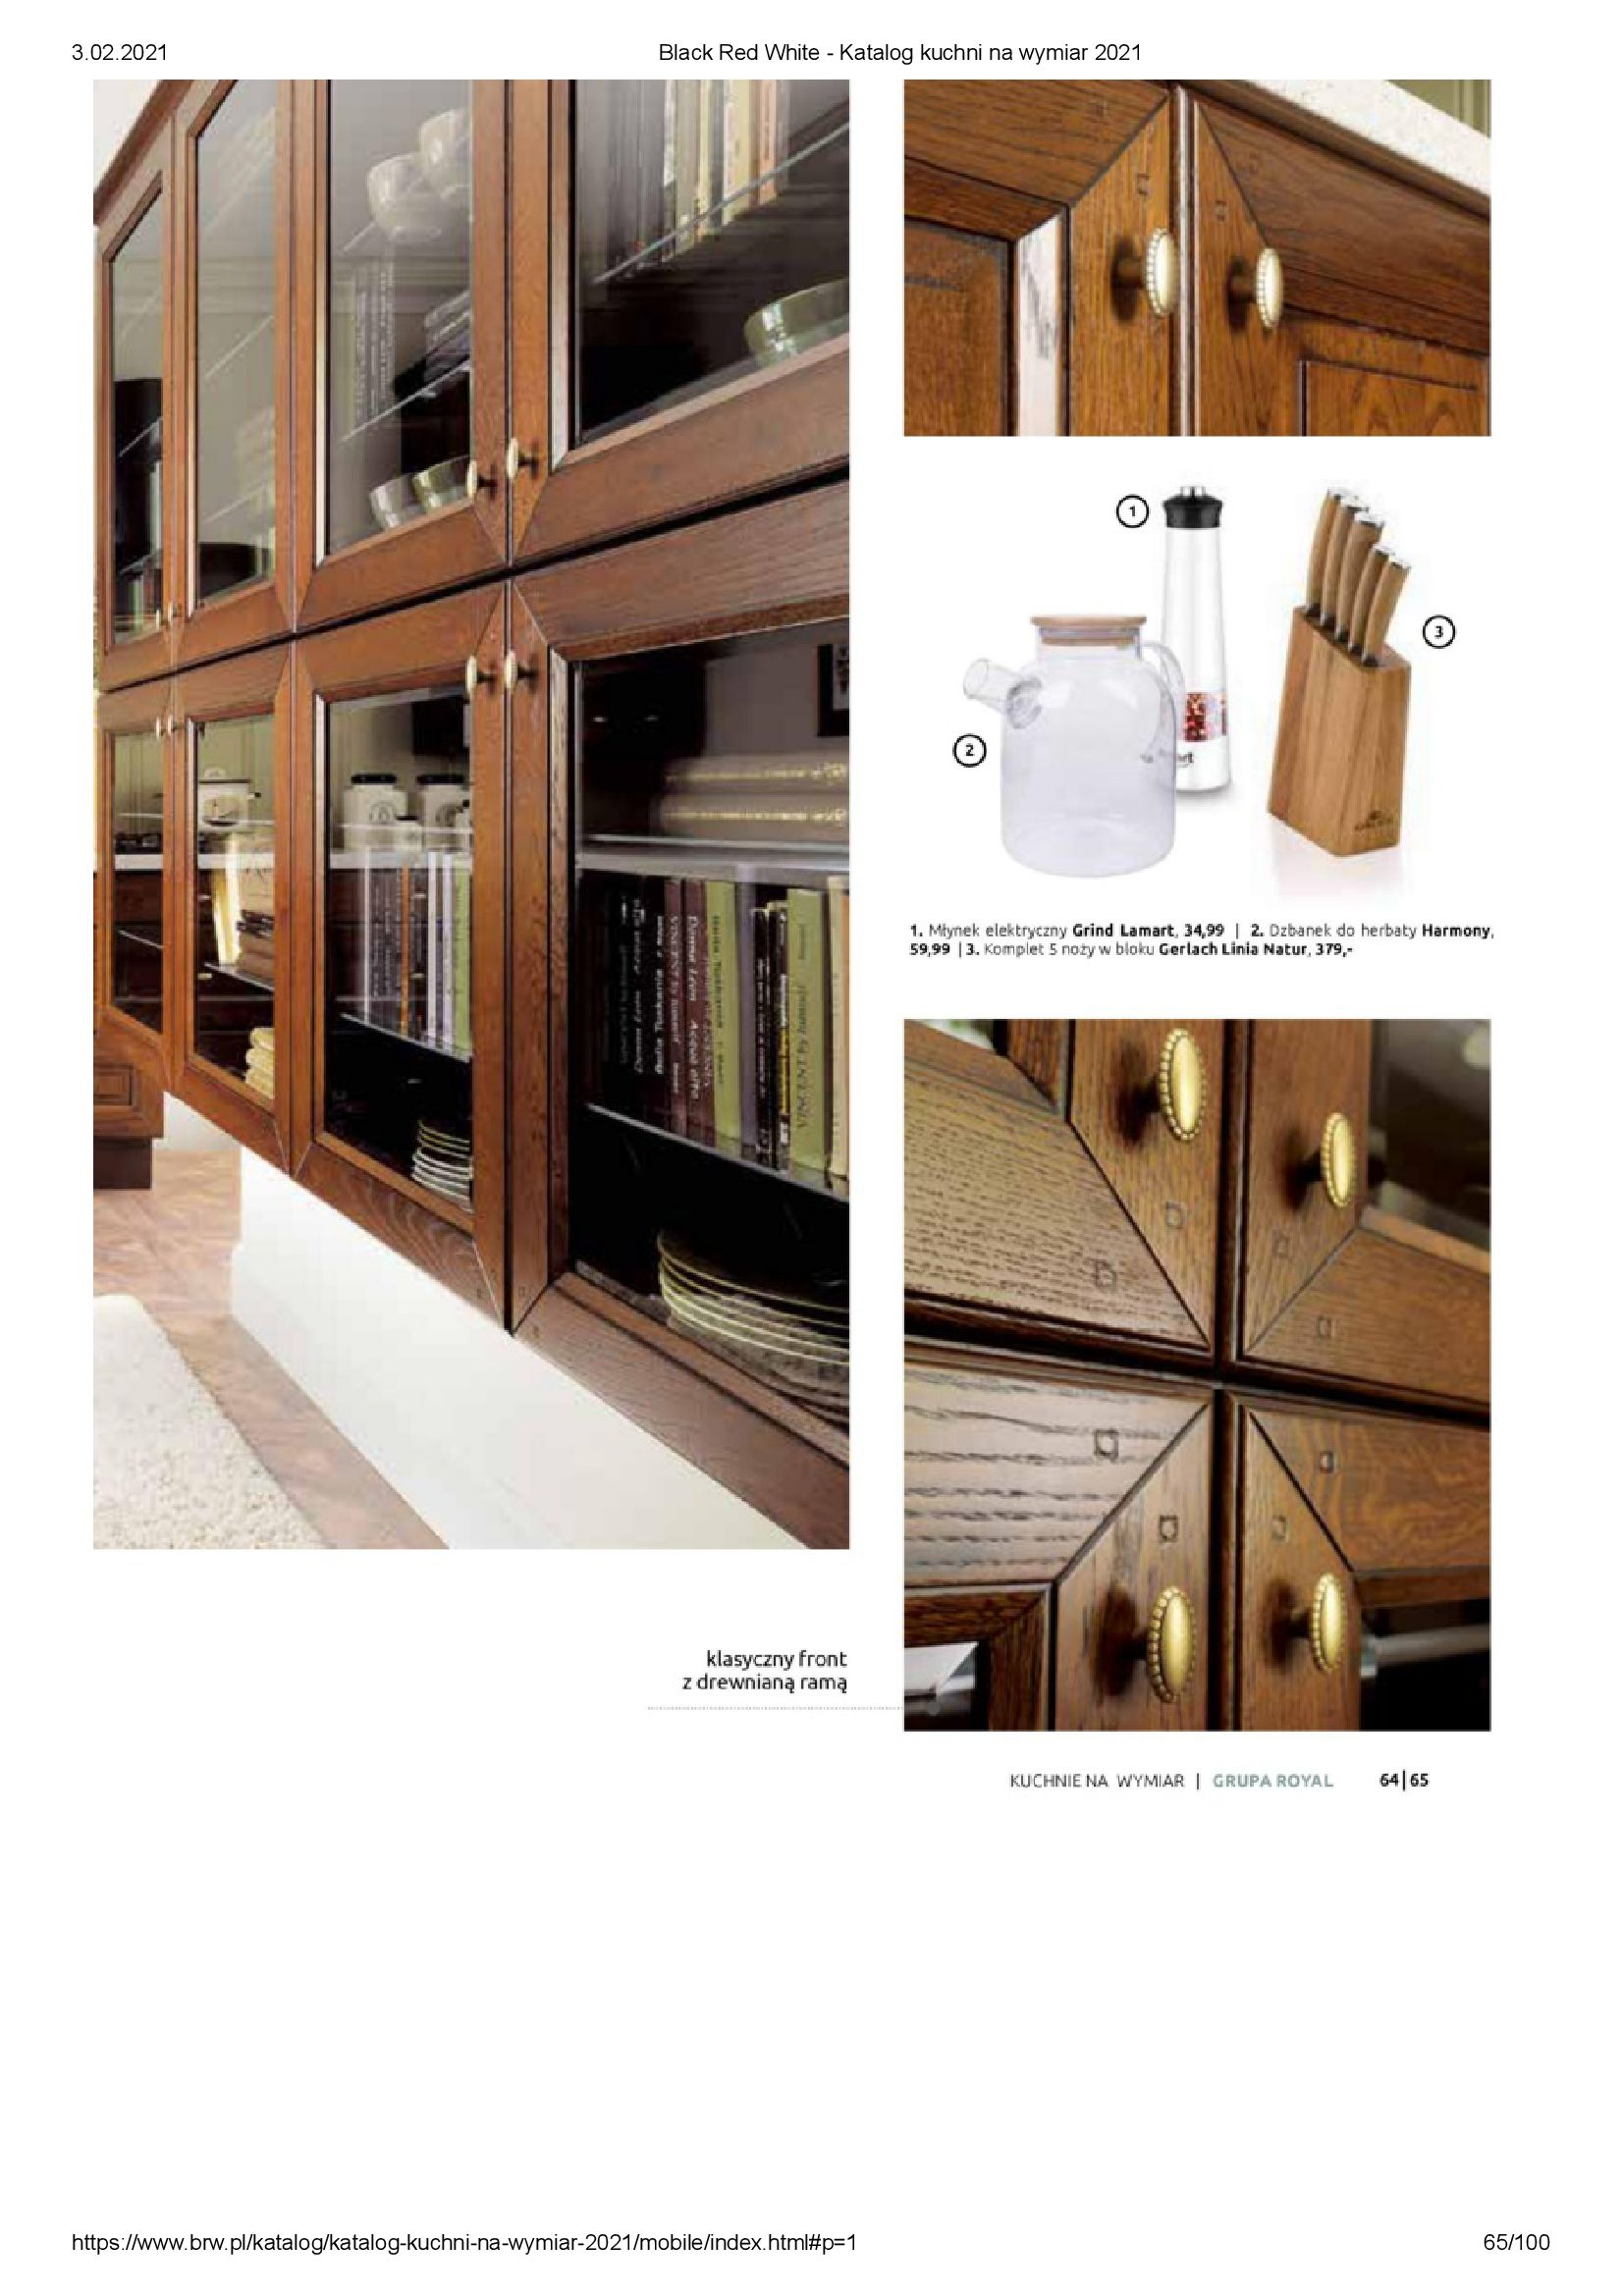 Gazetka Black Red White: Katalog - Kuchnie na wymiar Senso Kitchens 2021 2021-01-01 page-65